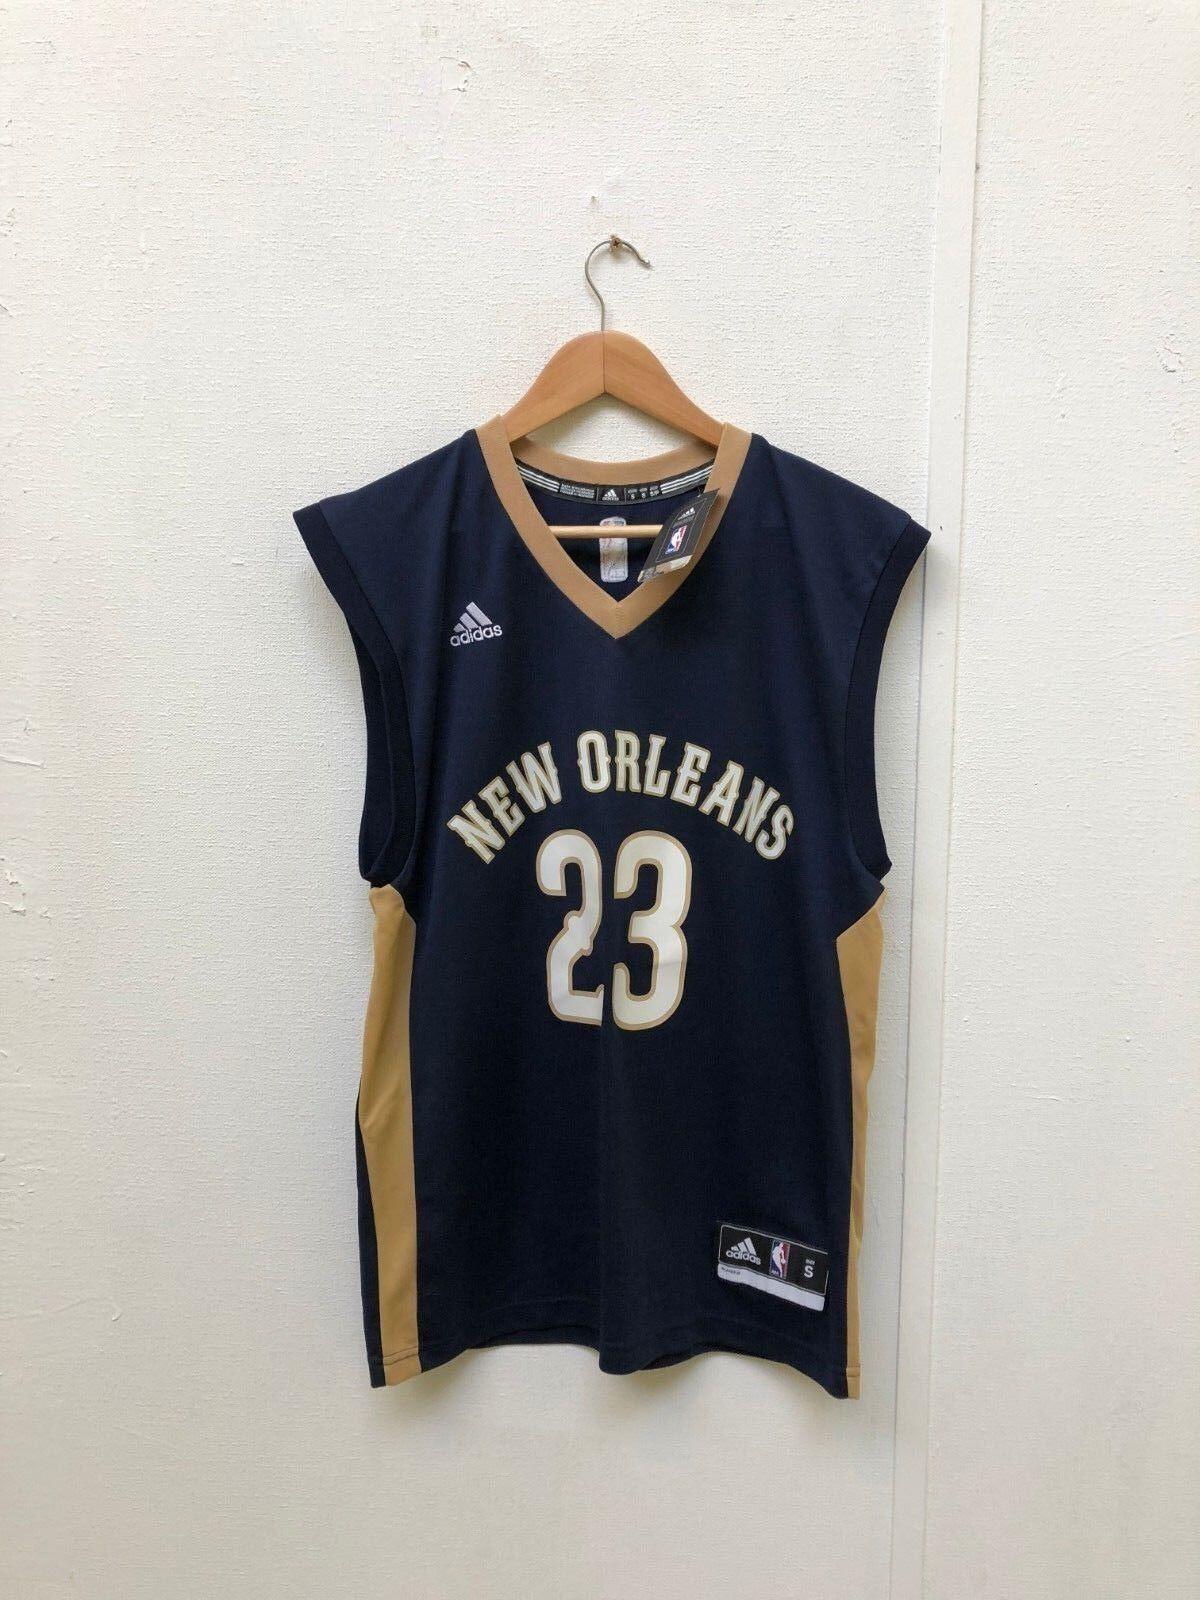 Adidas Men's NBA New Orleans Pelicans 2018 Away Jersey - Small - Davis 23 - New